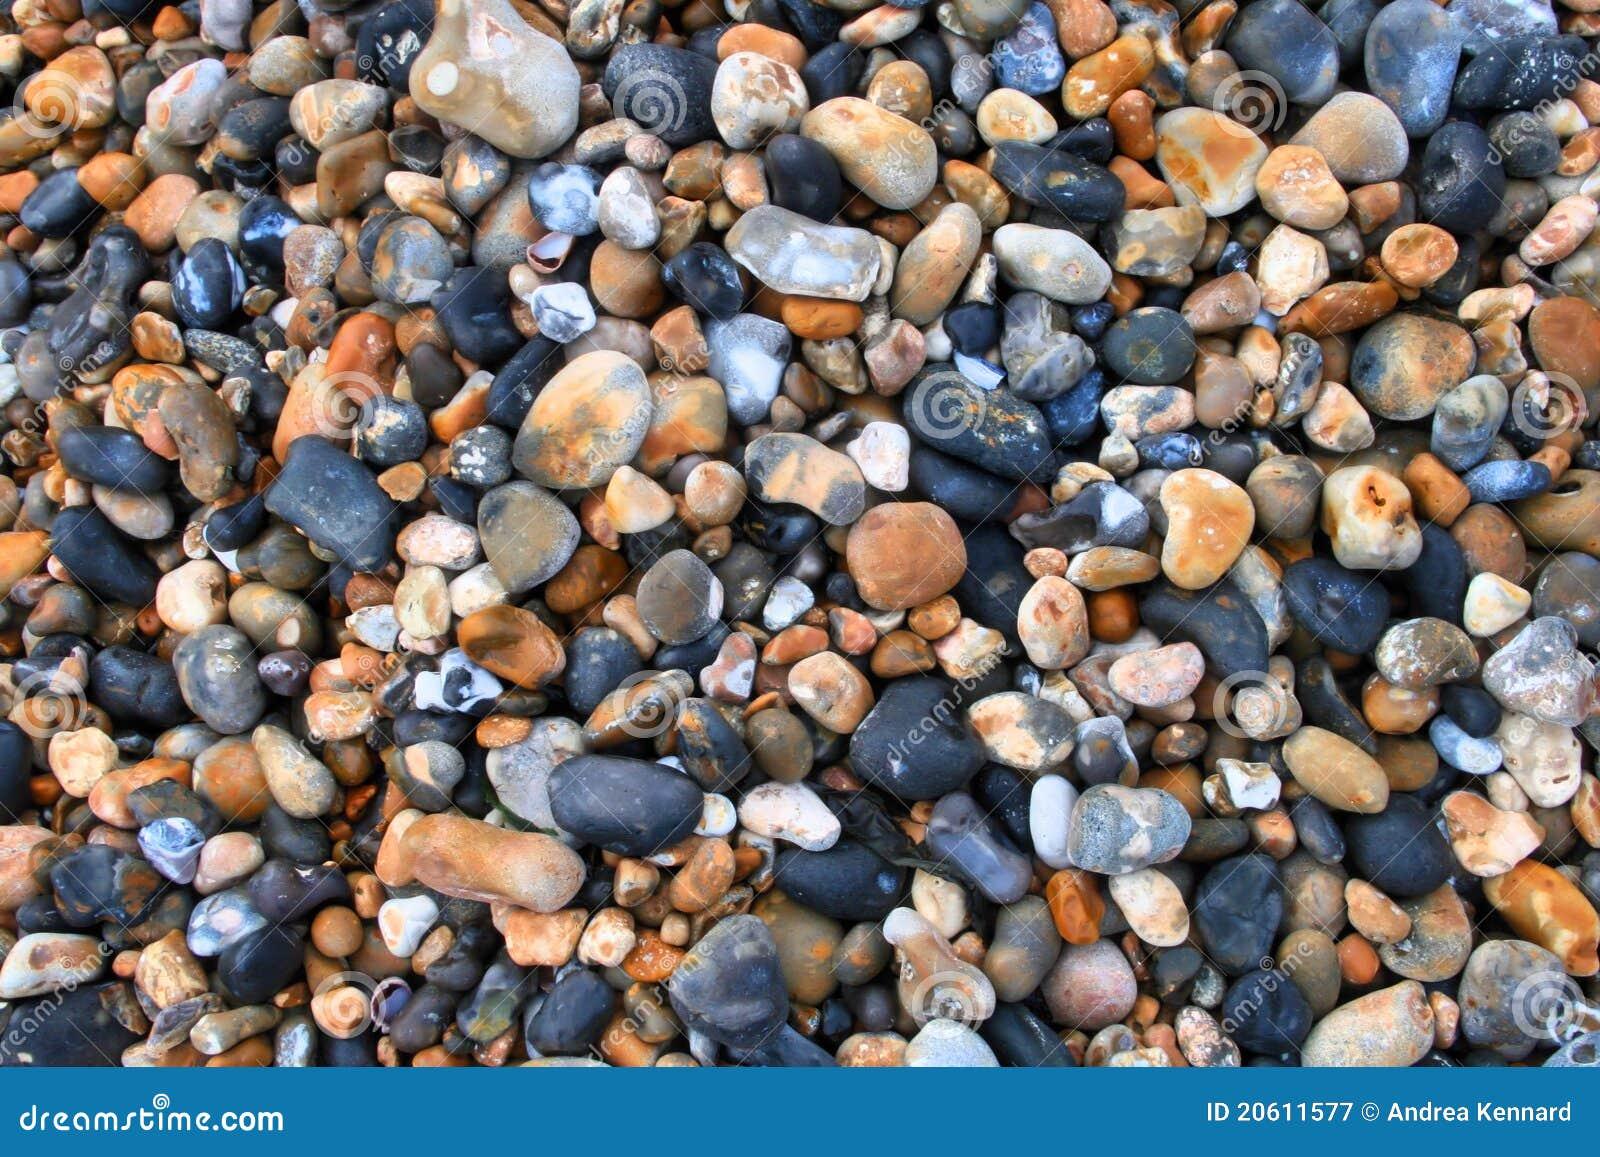 gravel pebbles stones background royalty free stock. Black Bedroom Furniture Sets. Home Design Ideas